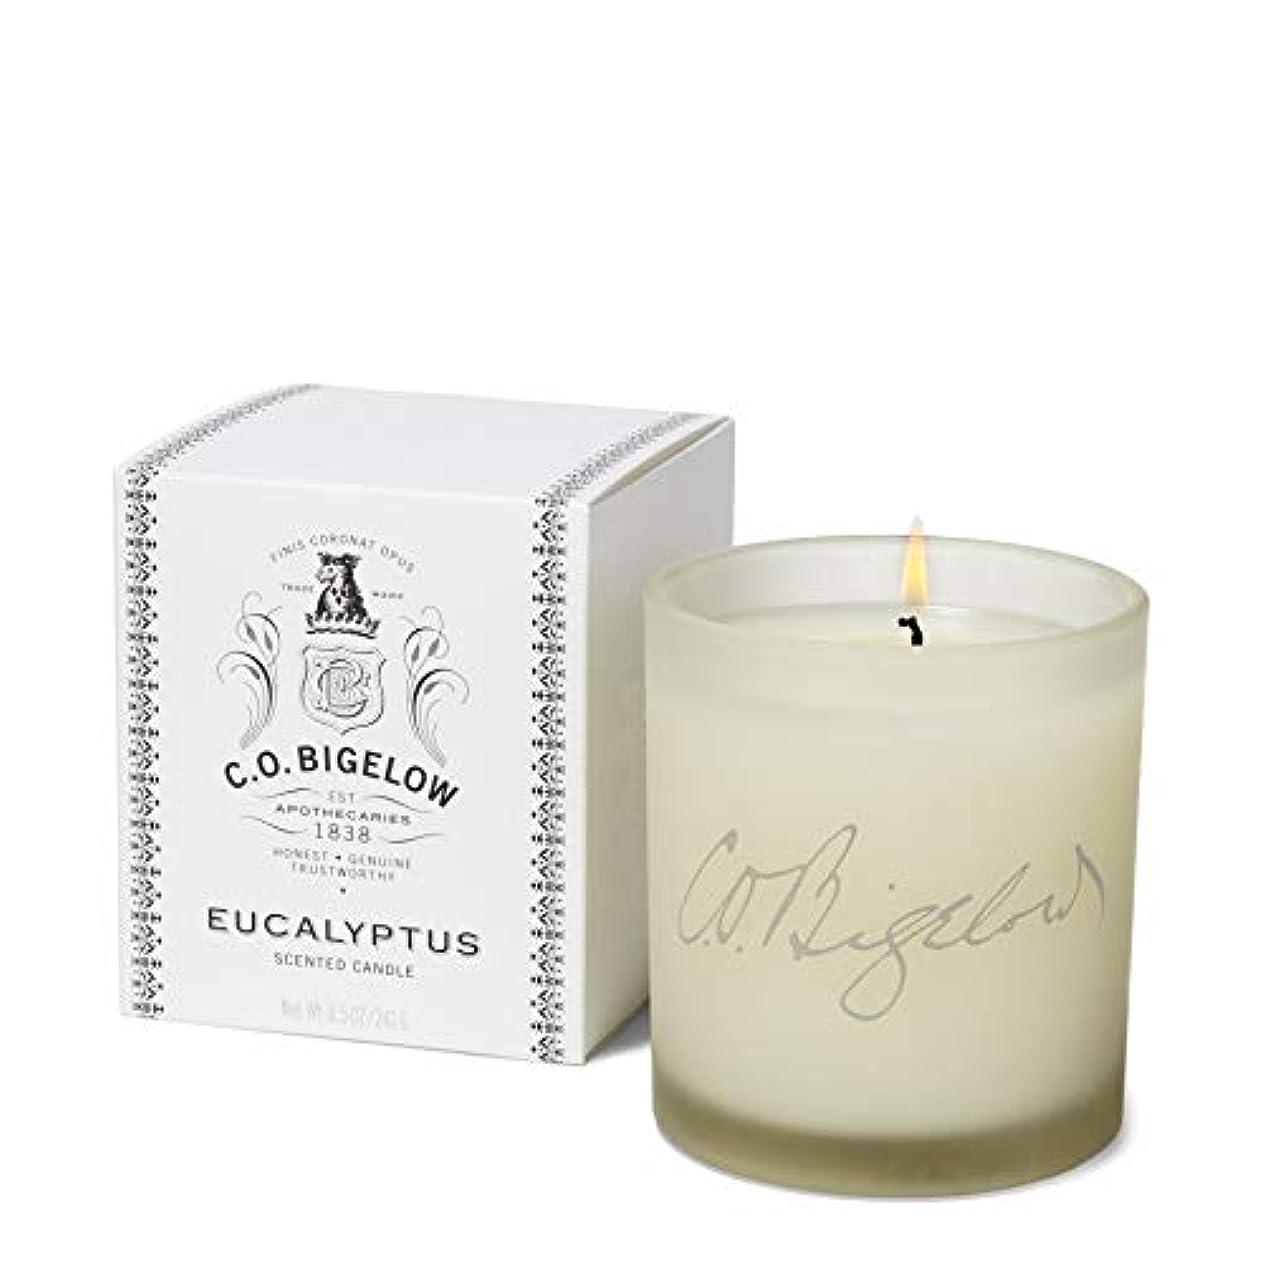 [C.O. Bigelow] C.O.ビゲローユーカリの香りのキャンドル - C.O. Bigelow Eucalyptus Scented Candle [並行輸入品]